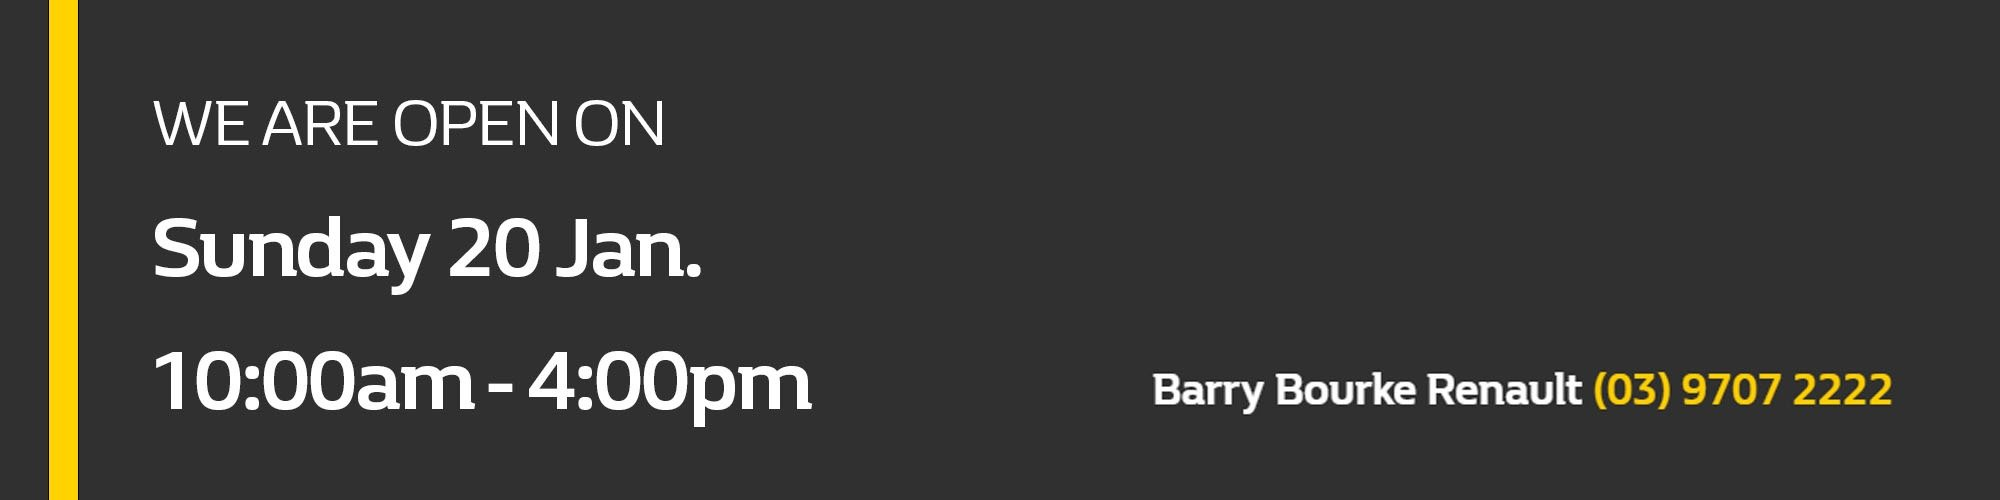 BarryBourkeRenault-open on 20Jan.